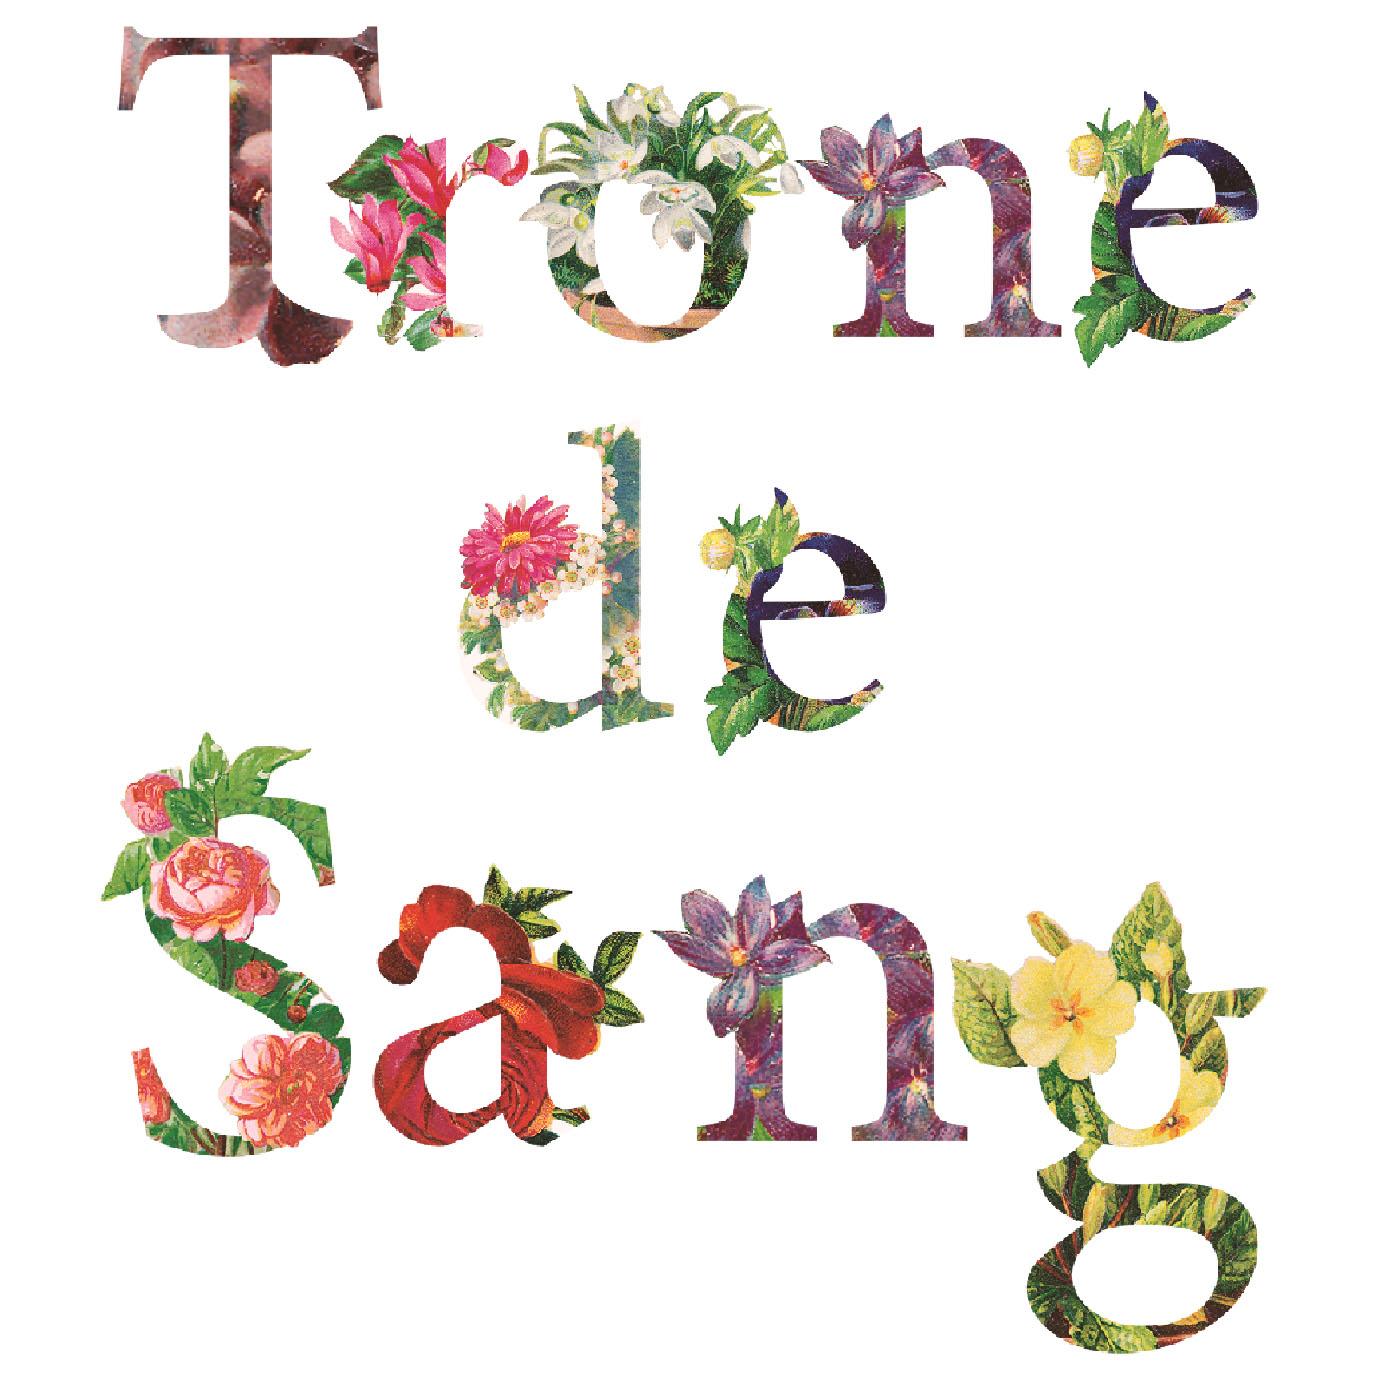 trone de Sang - Logo 1 1400px.jpg